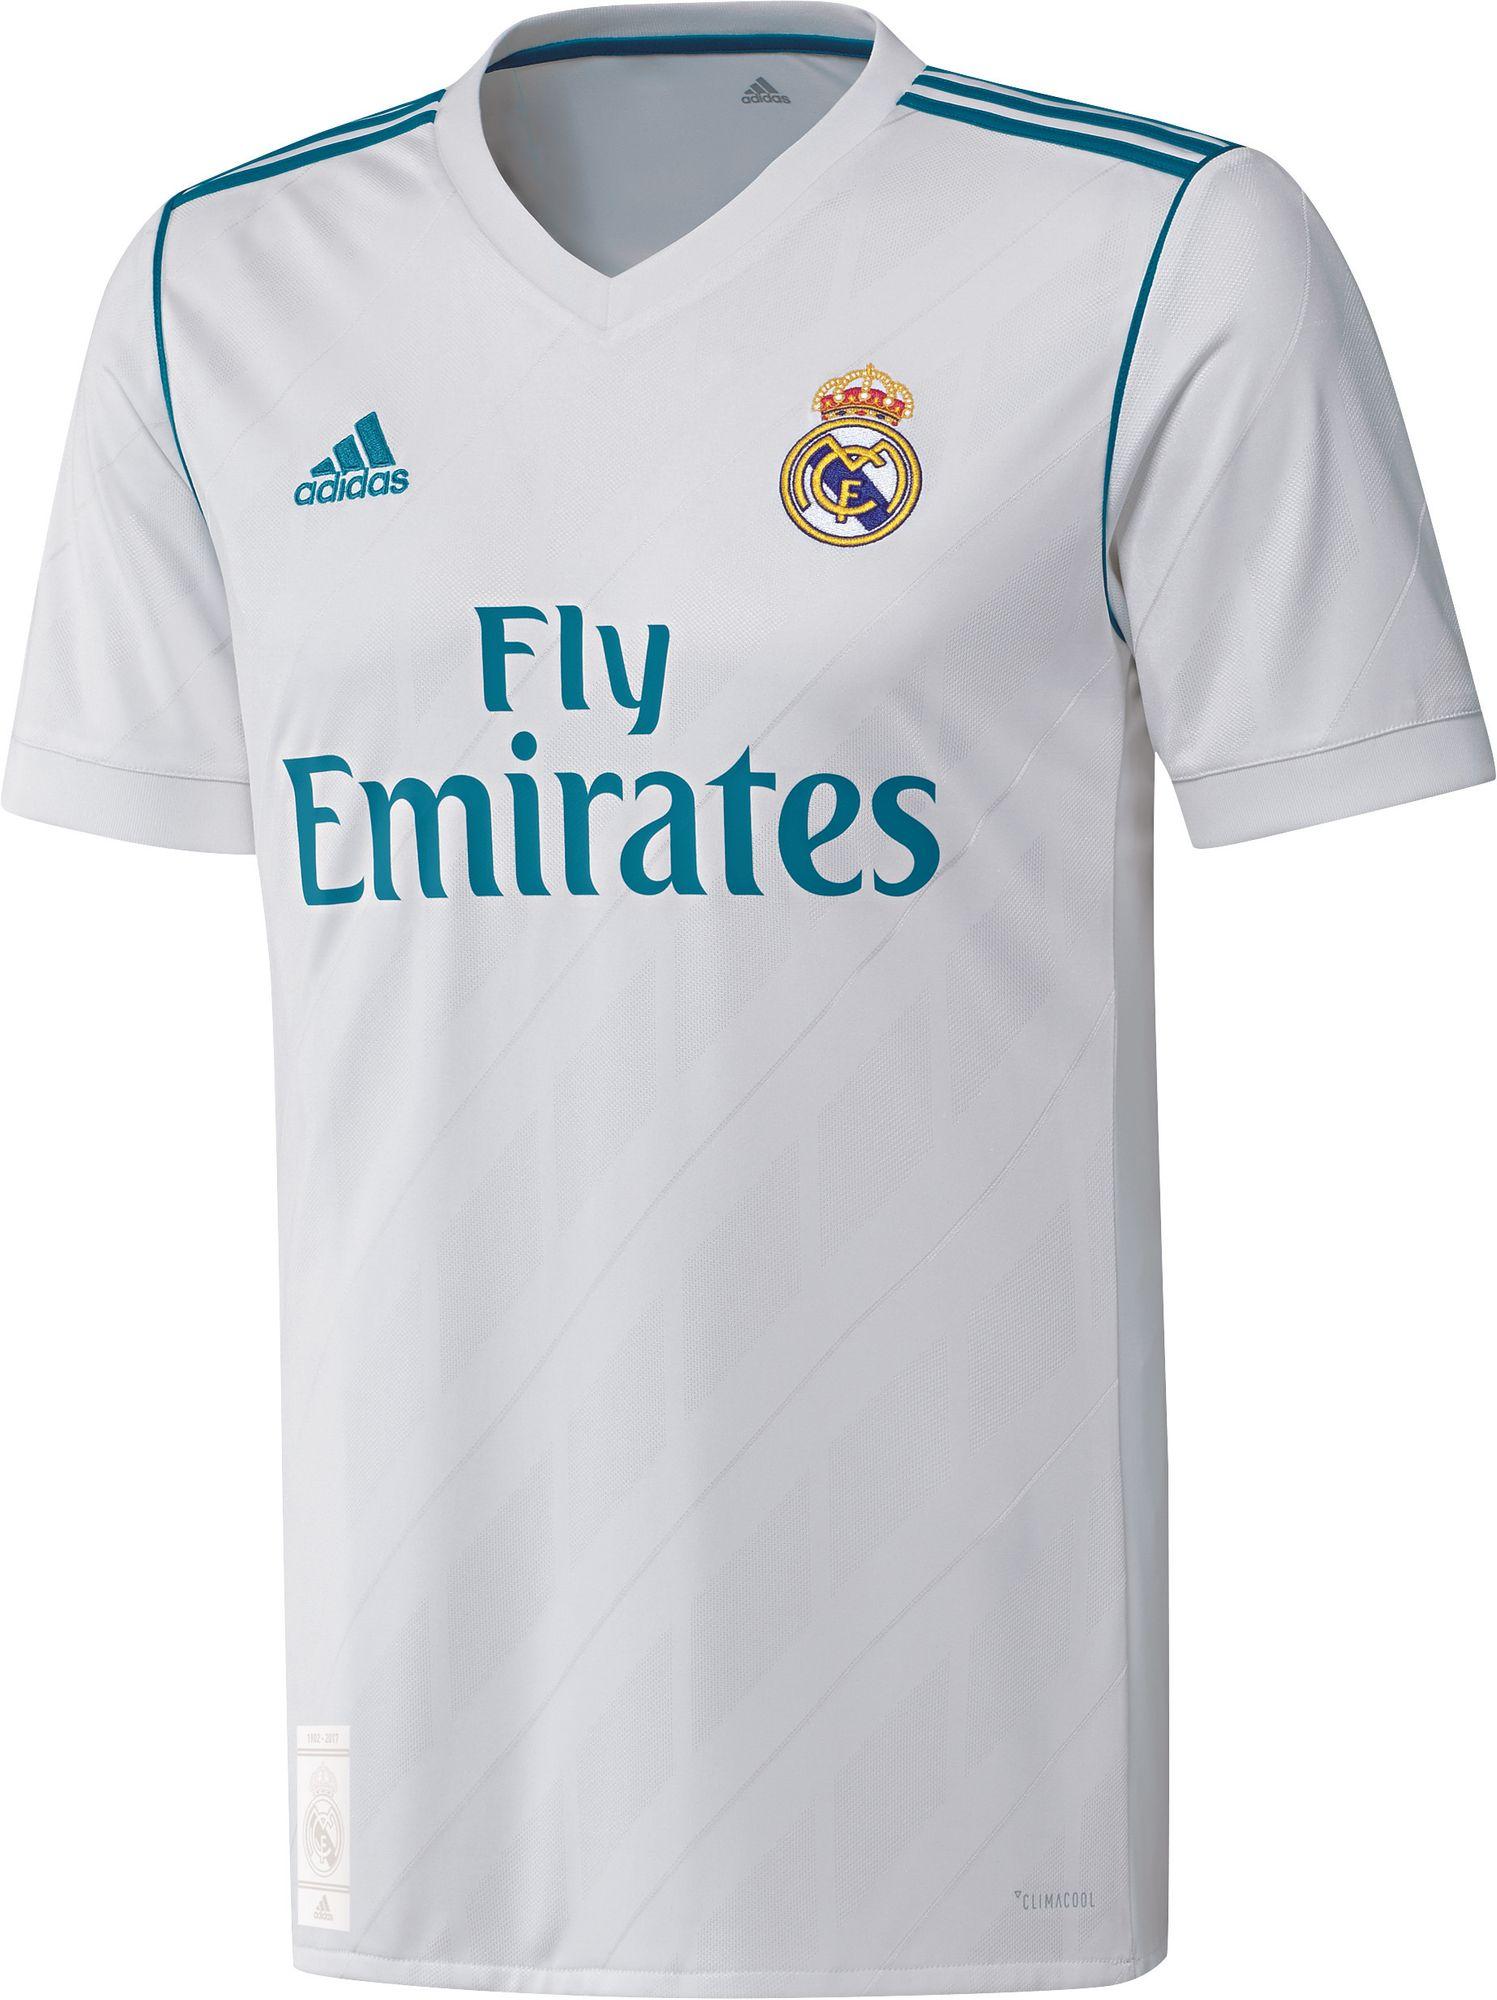 adidas REAL MADRID Trikot Home Kinder 2017 2018